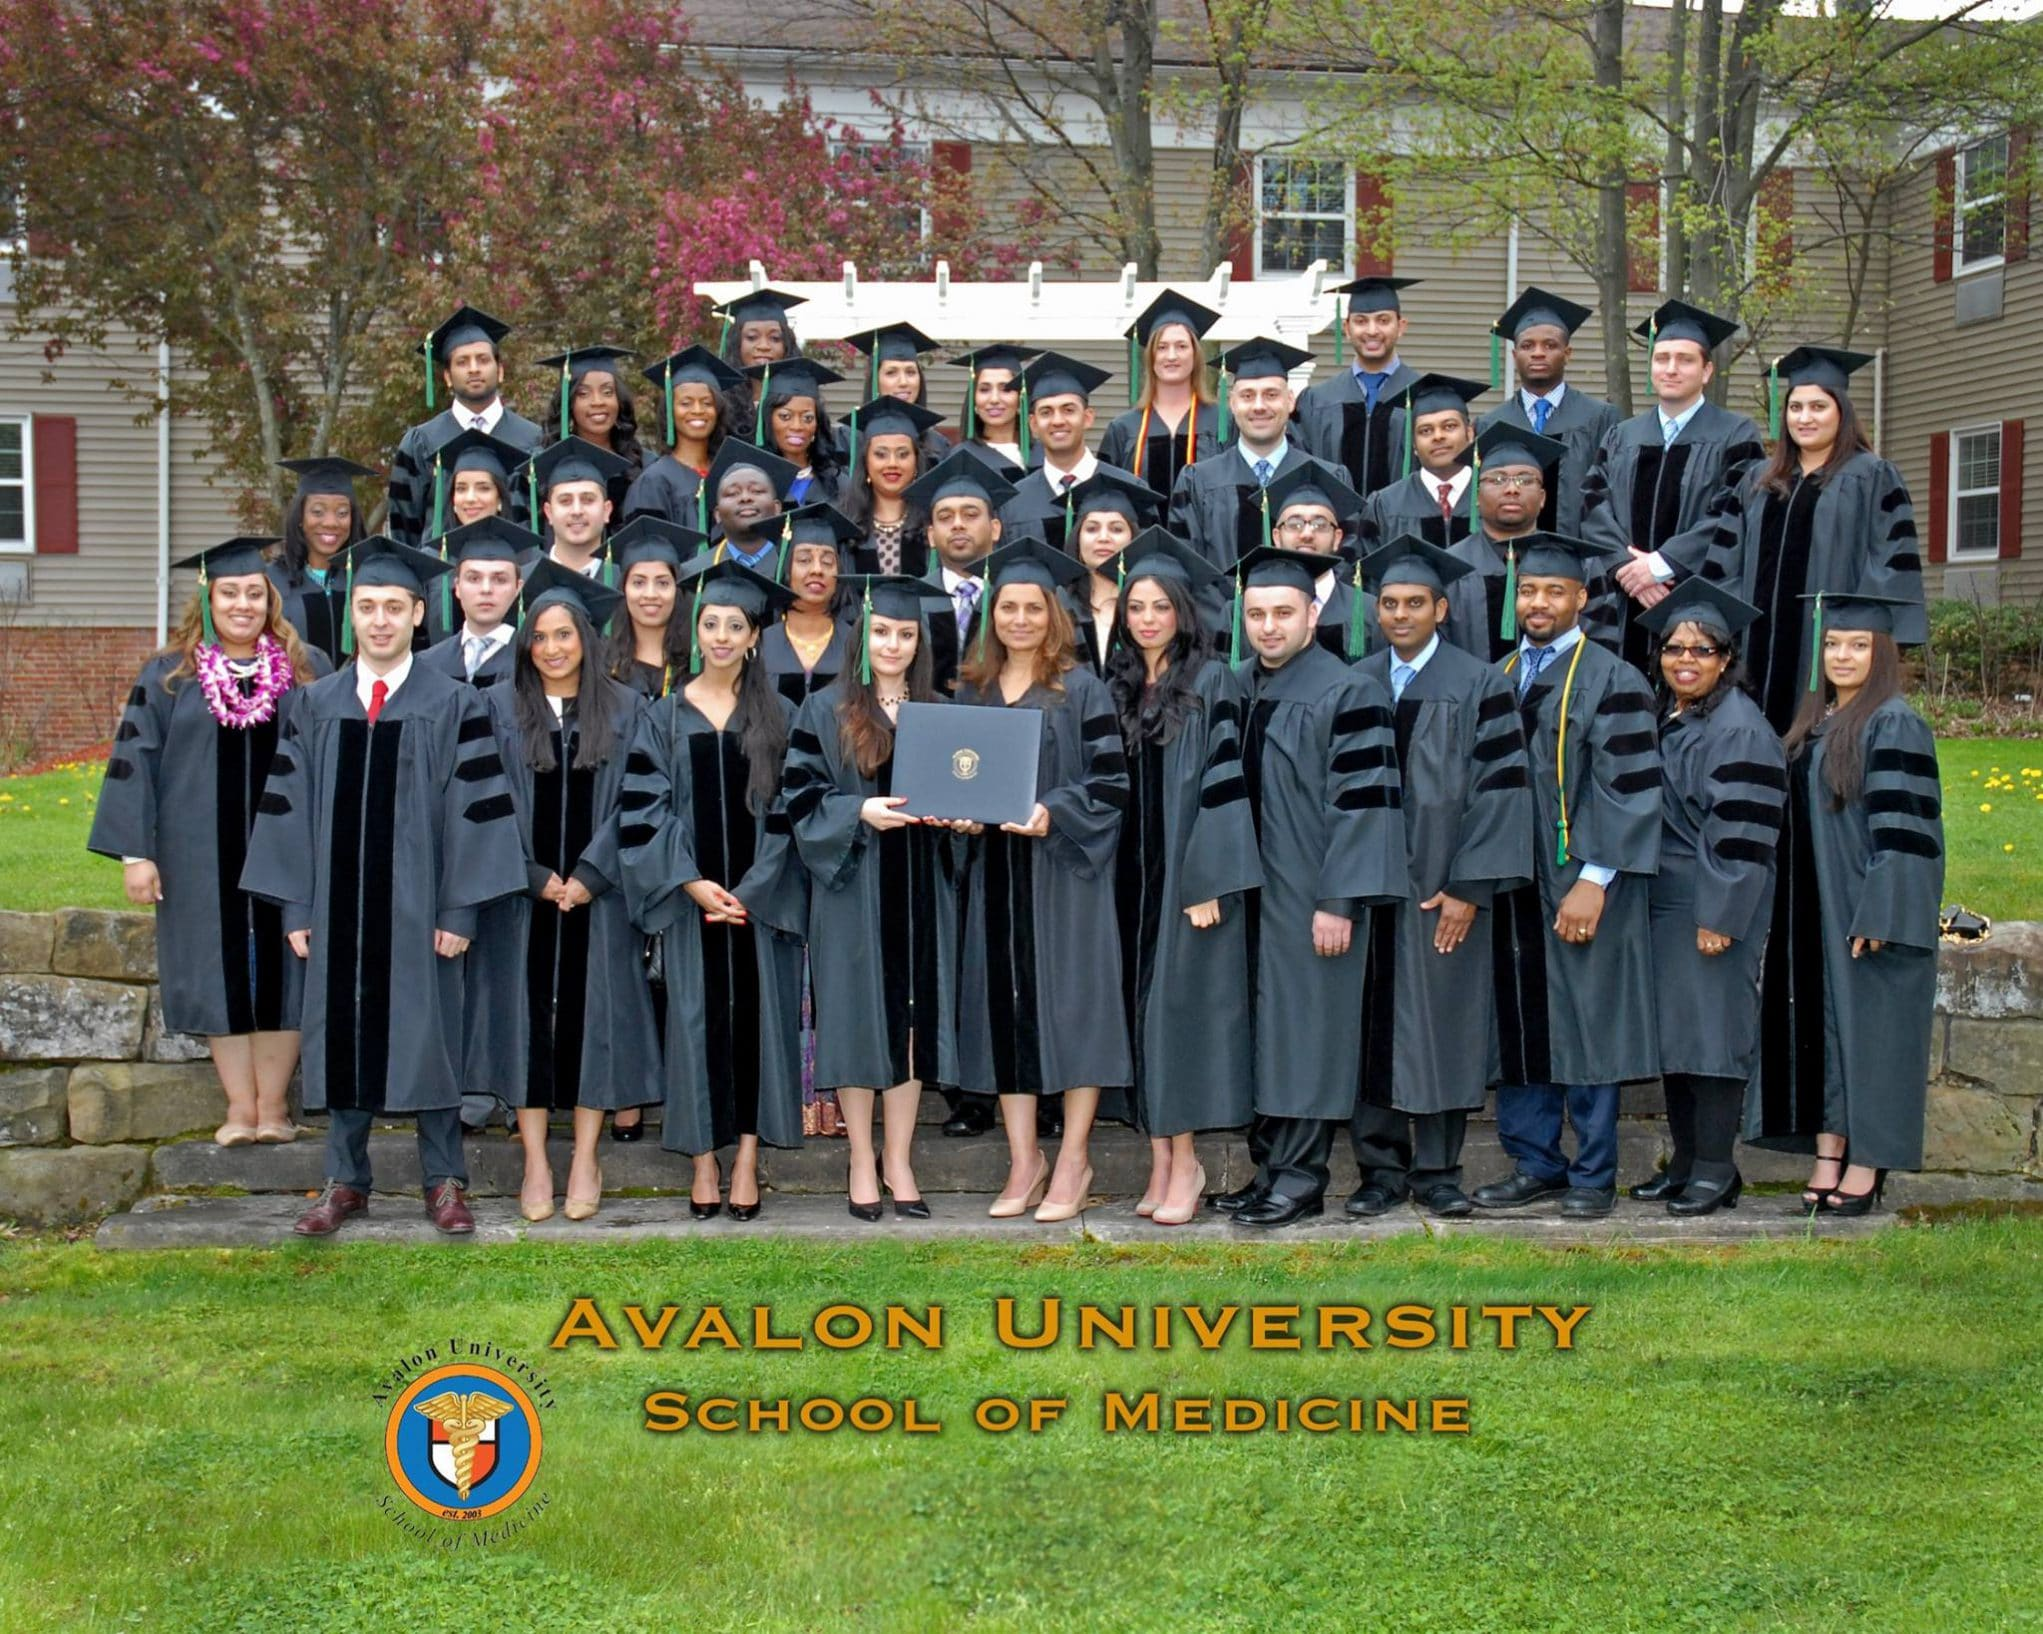 Avalon University School of Medicine--Ausom